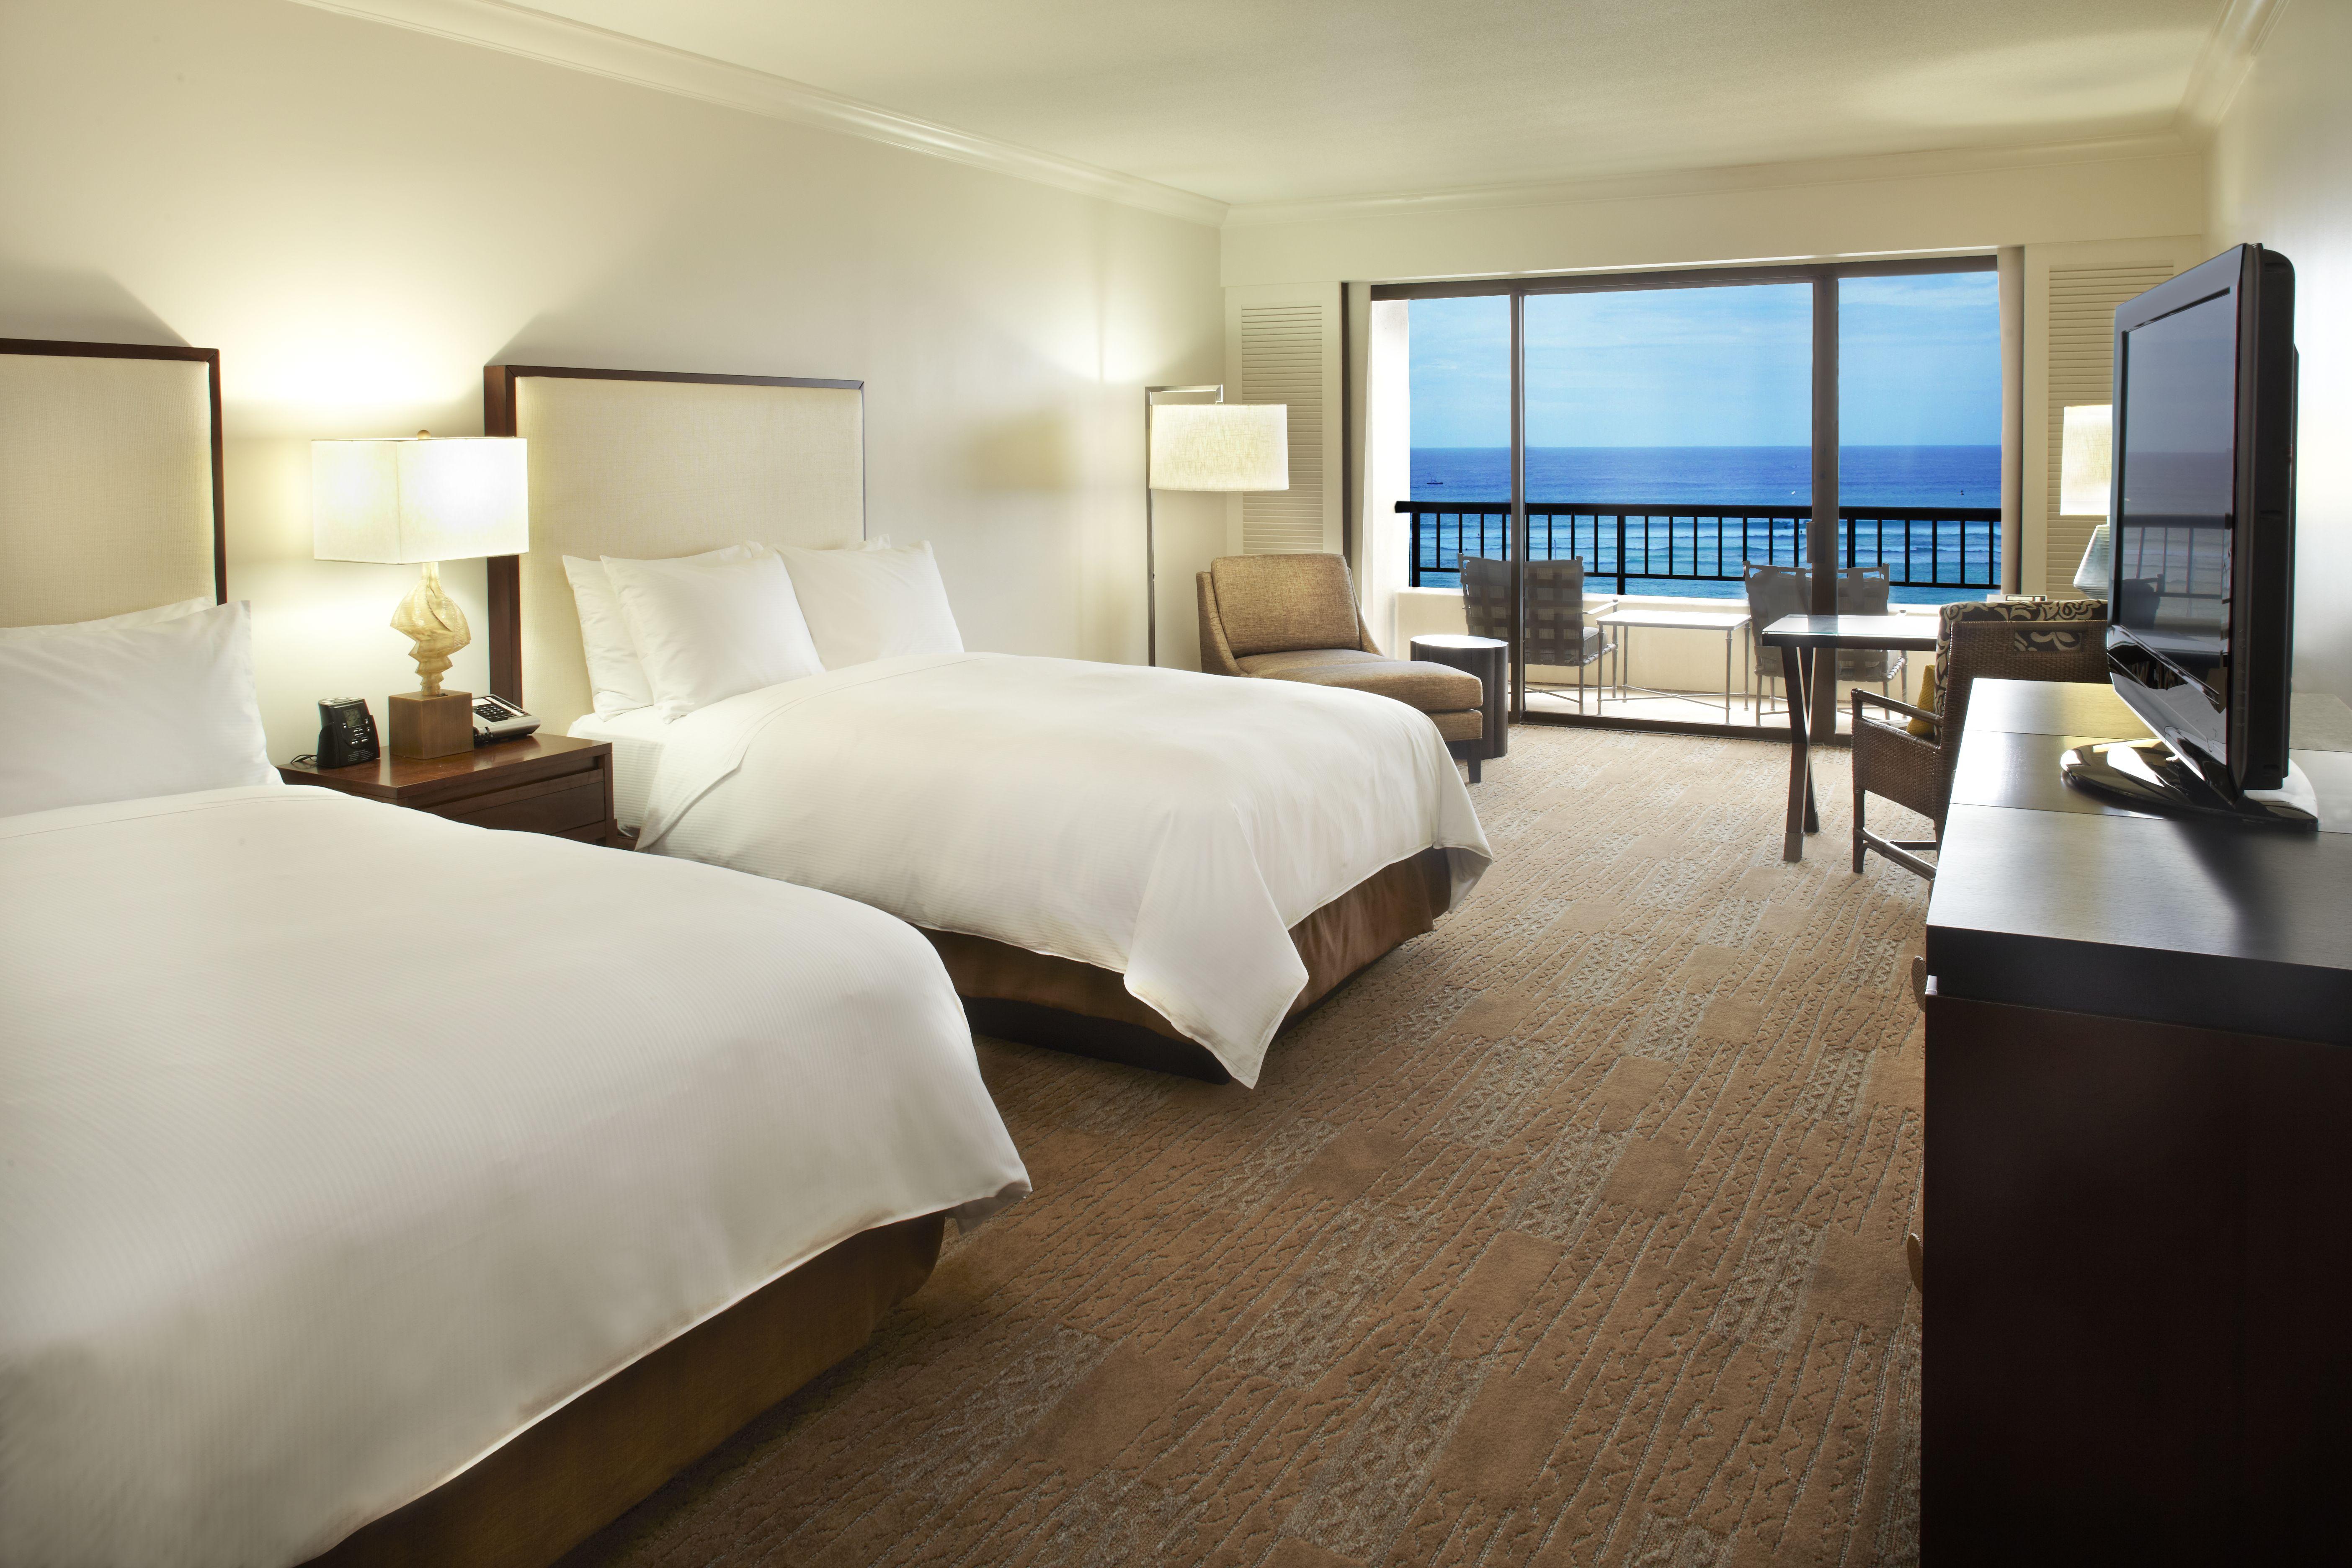 Village Hotel Room Types